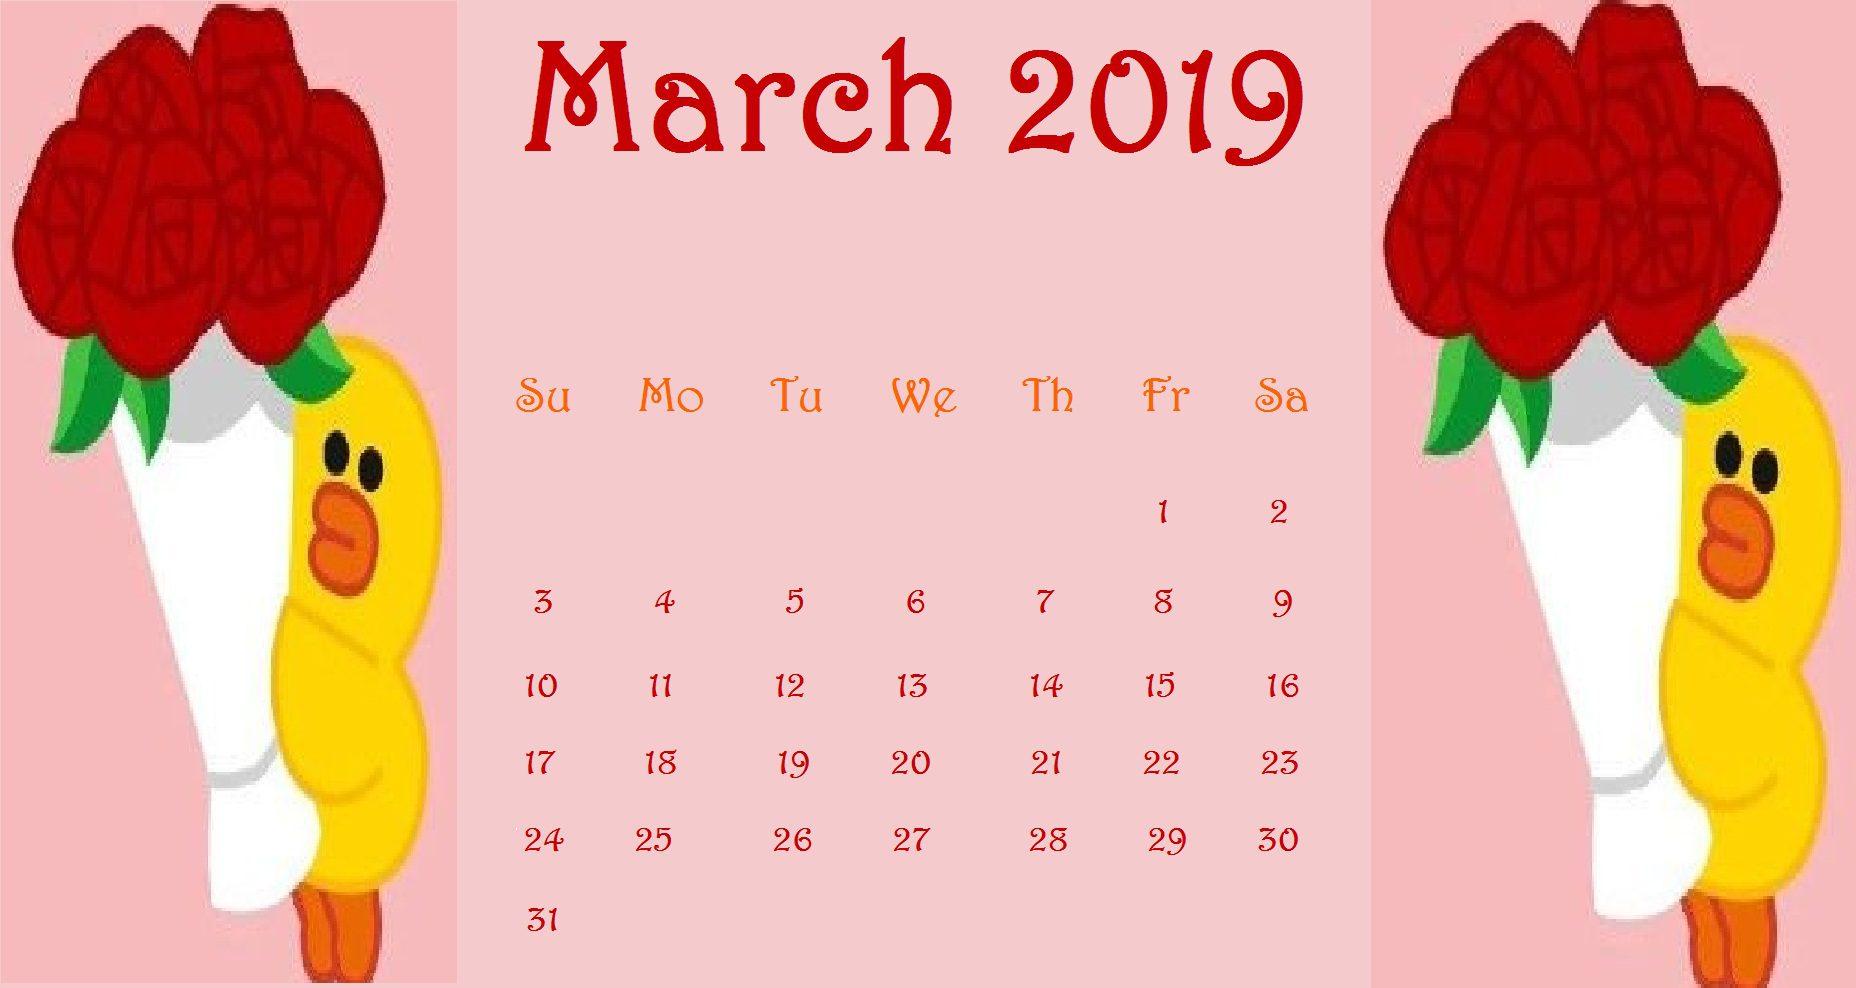 Simple background desktop March 2019 wallpaper